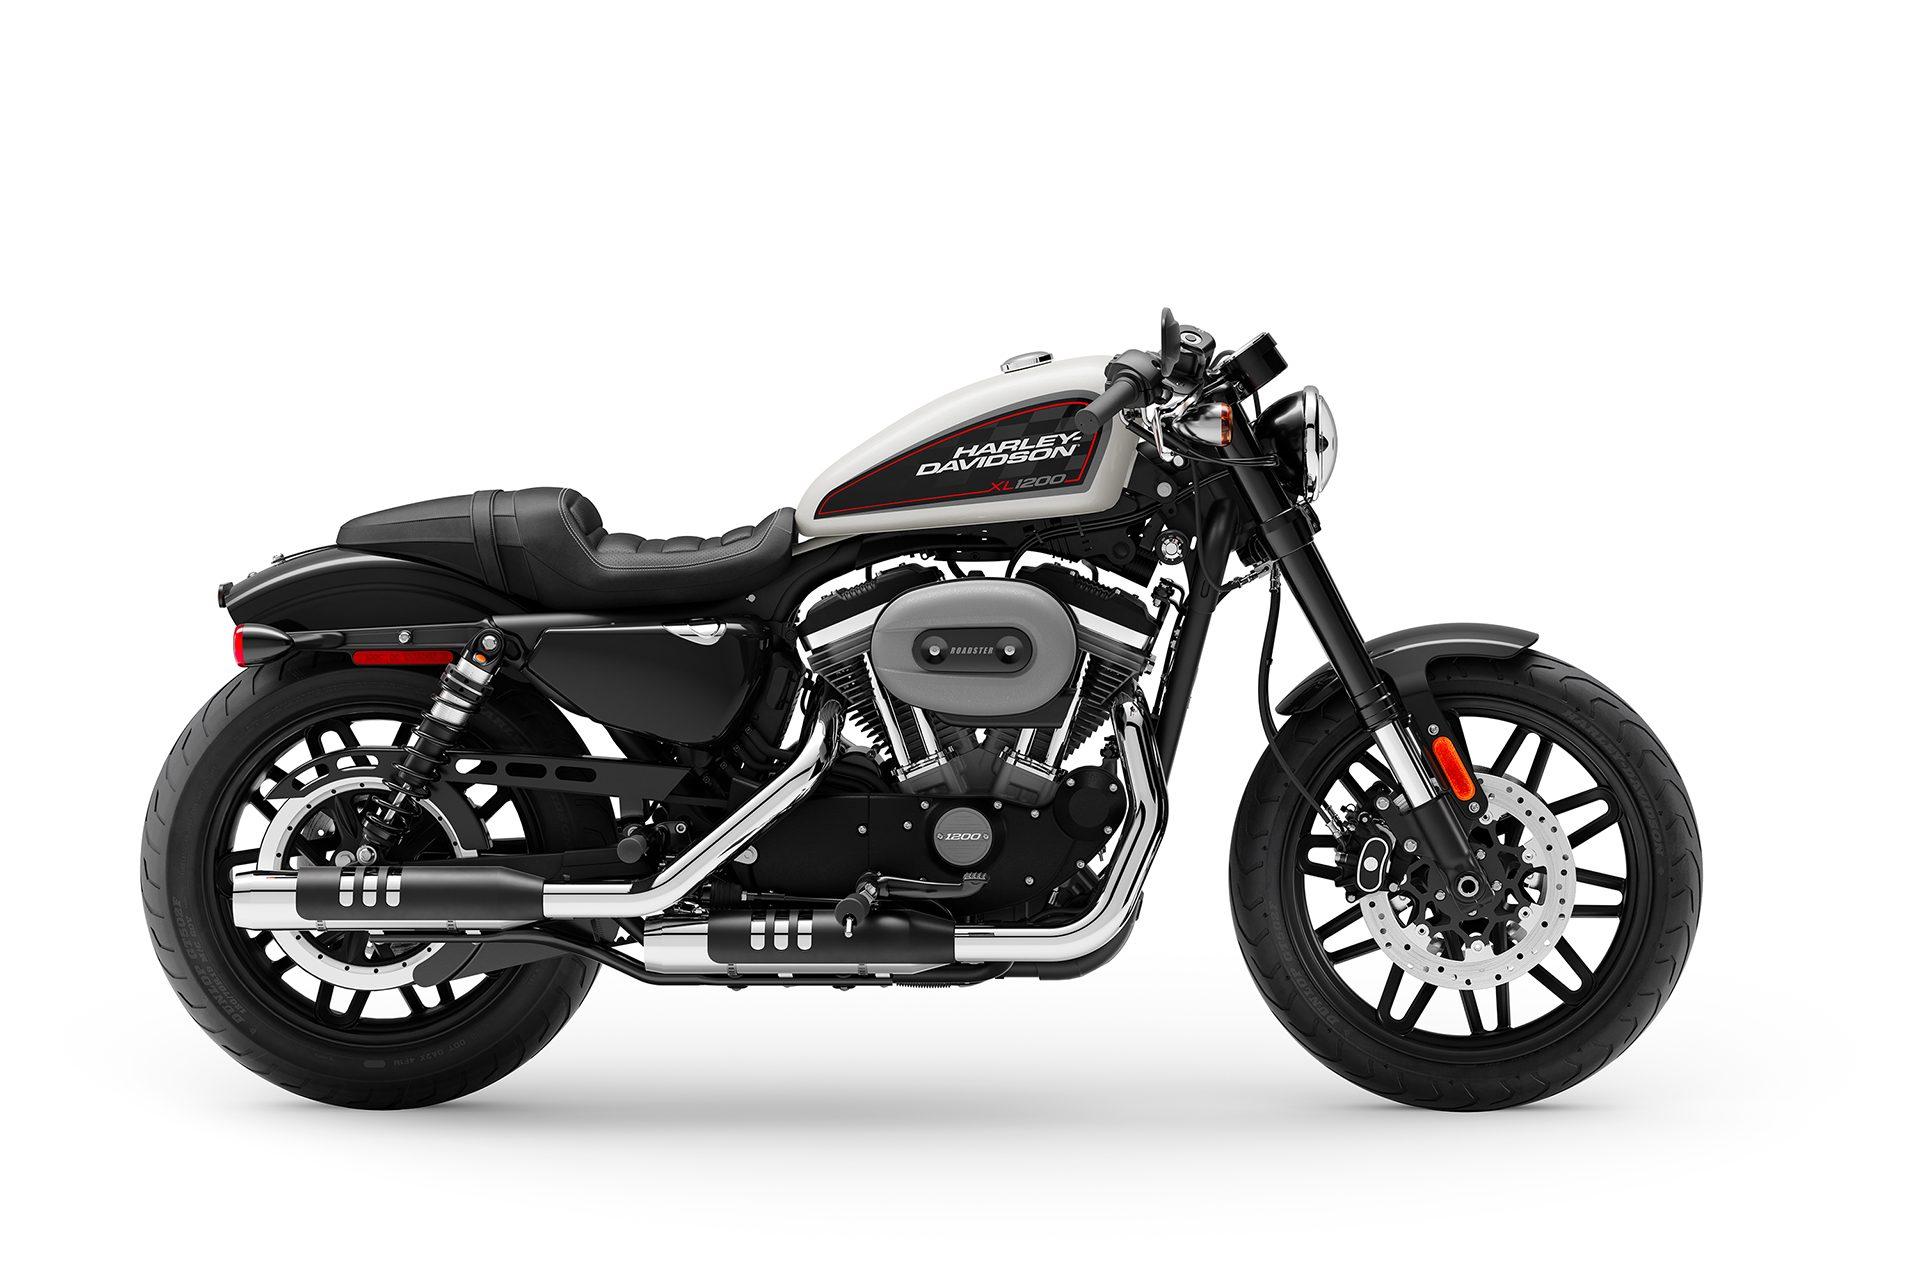 Harley-Davidson Roadster 2019 Neufahrzeug kaufen bei Thunderbike